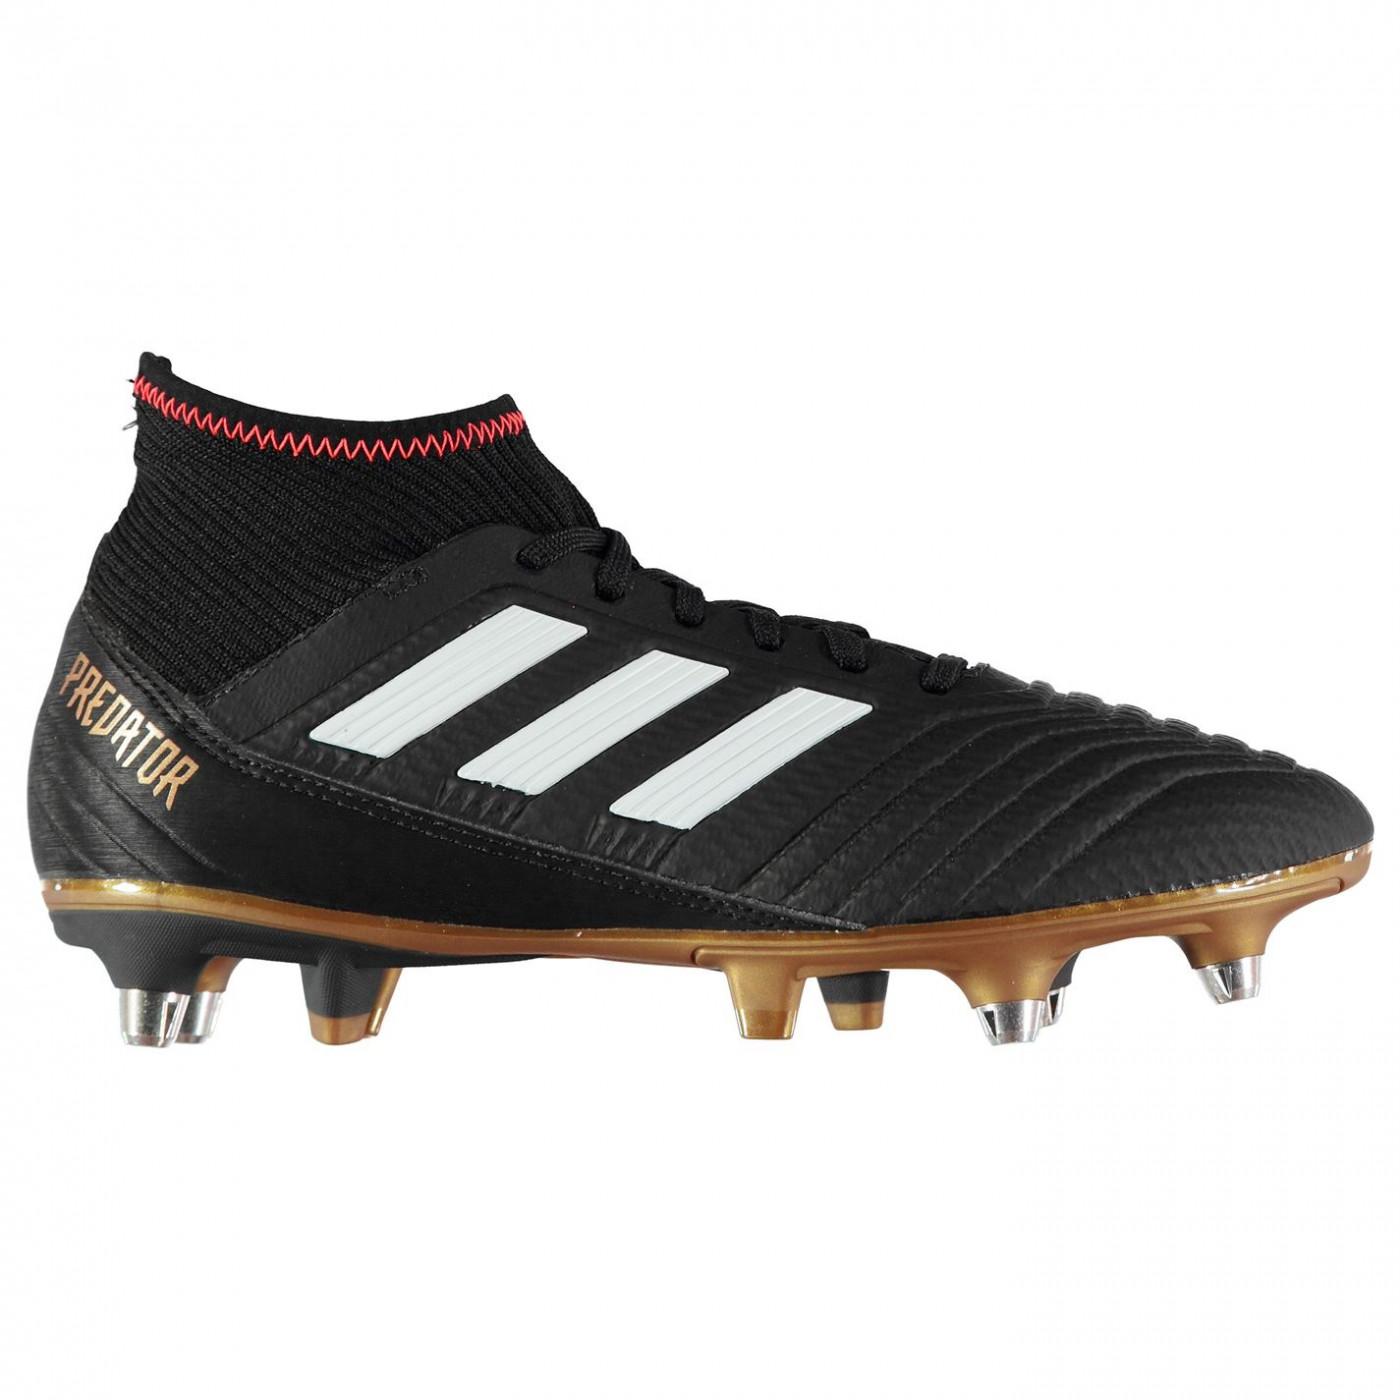 091fd23f035ff Adidas Predator 18.3 Mens SG Football Boots - FACTCOOL